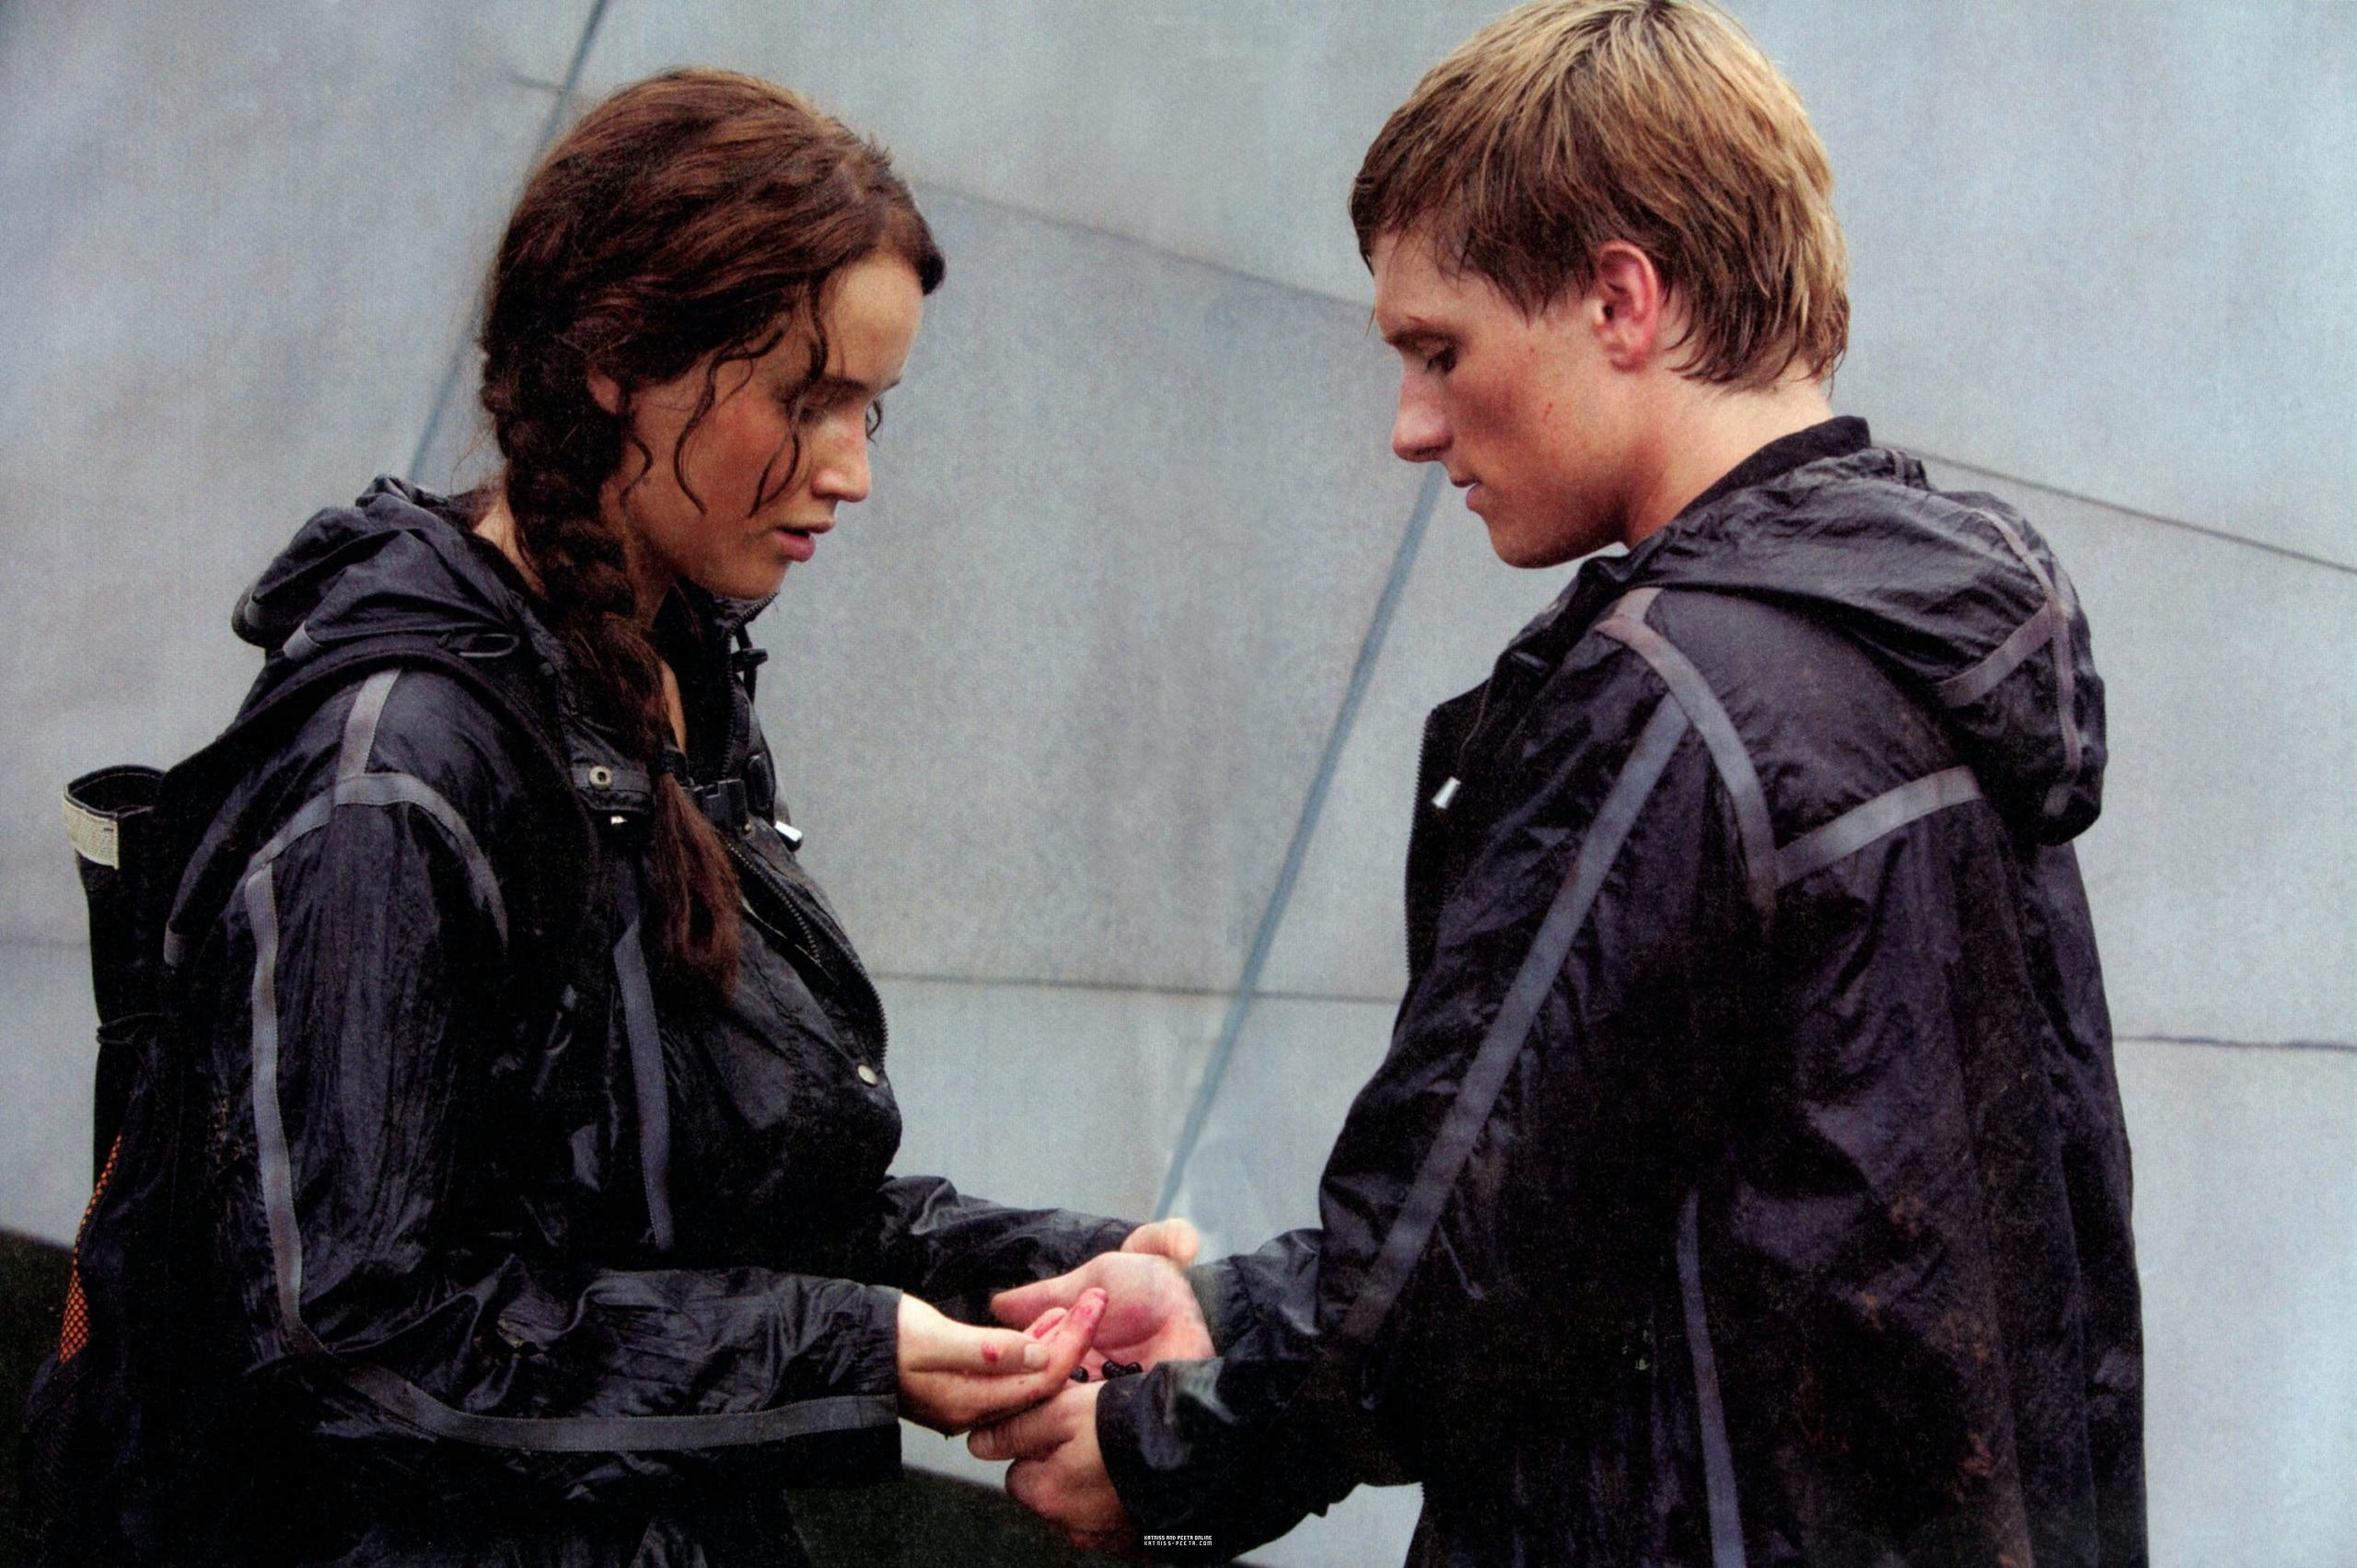 Peeta And Katniss Dating In Real Life